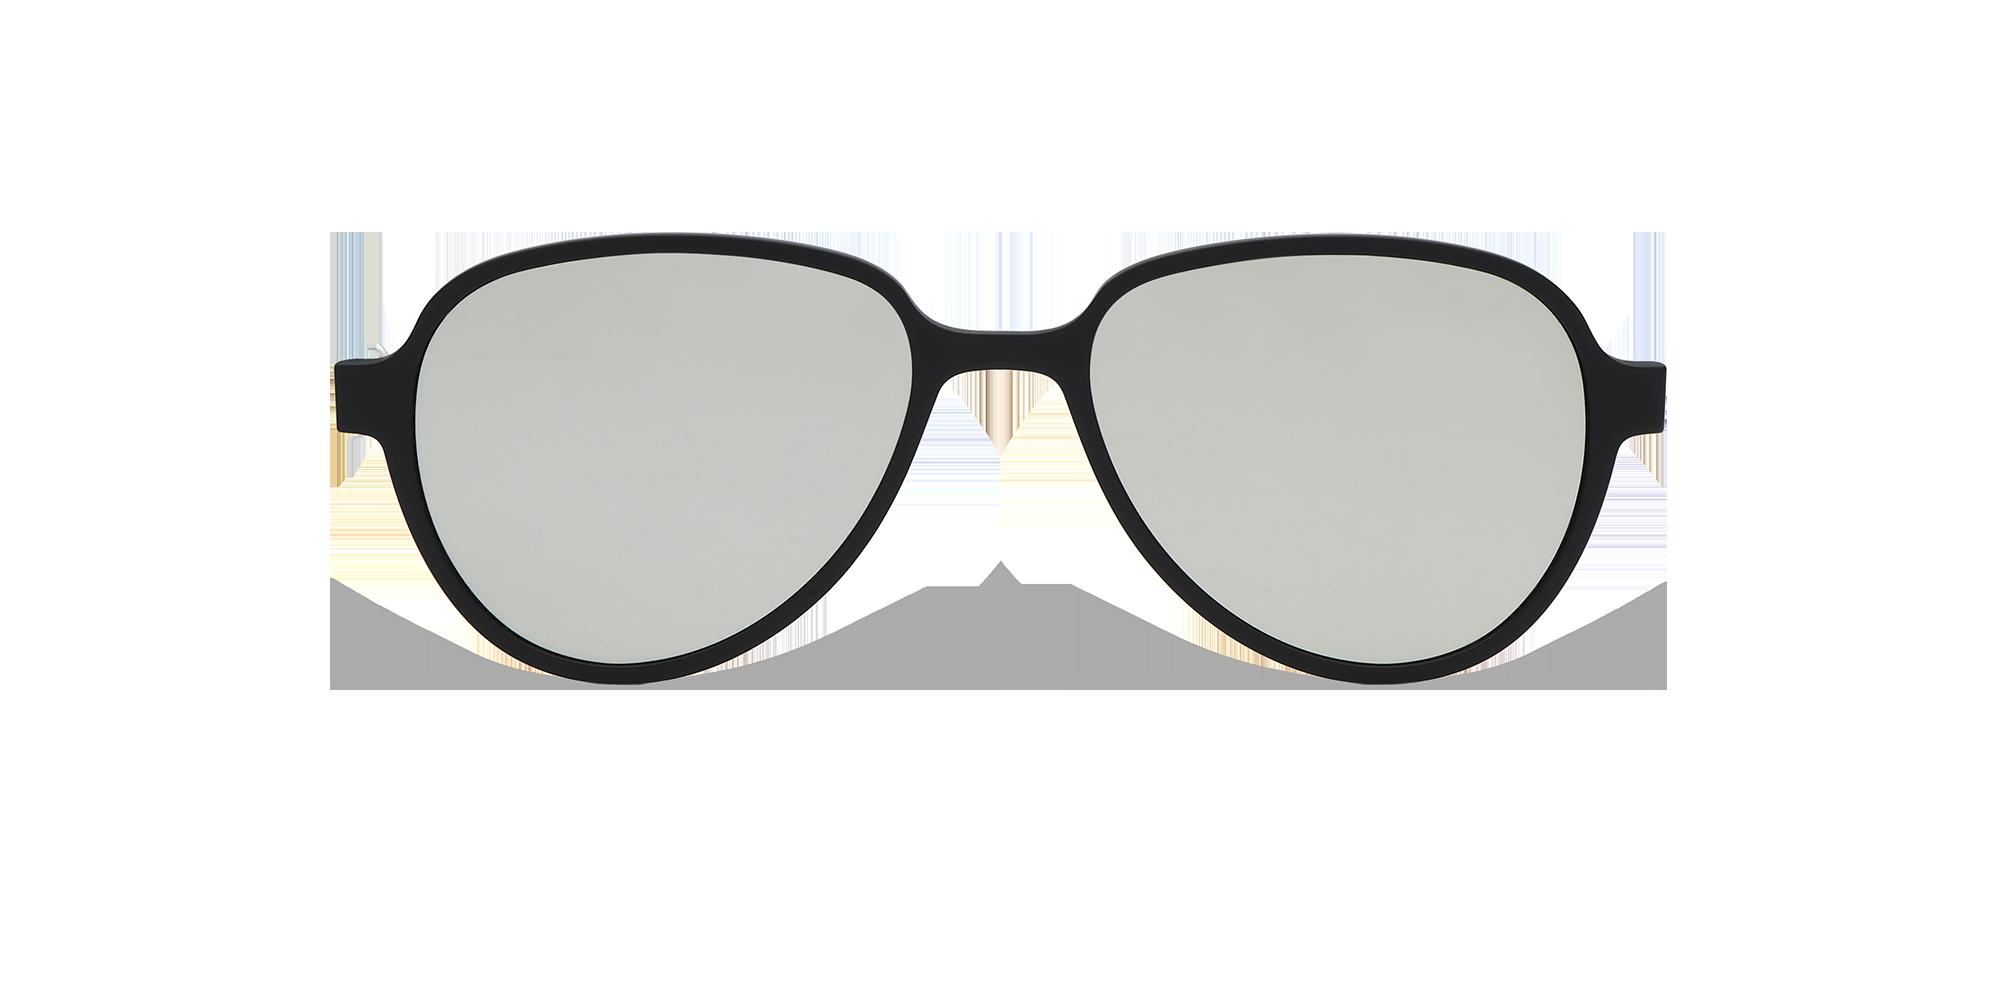 afflelou/france/products/smart_clip/clips_glasses/TMK43R3BK015417.png